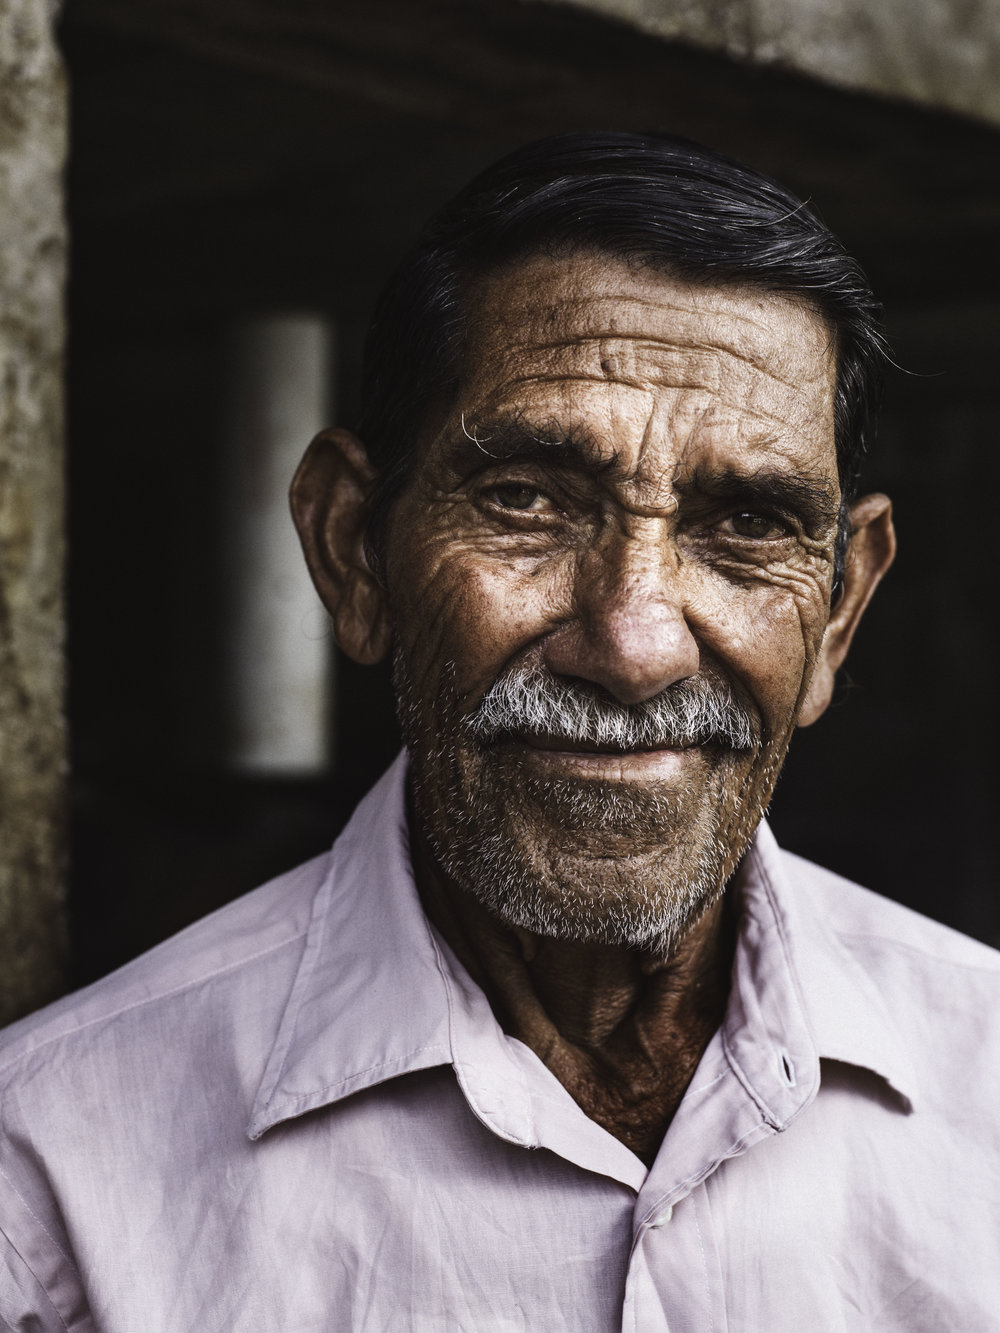 honduran men and relationships